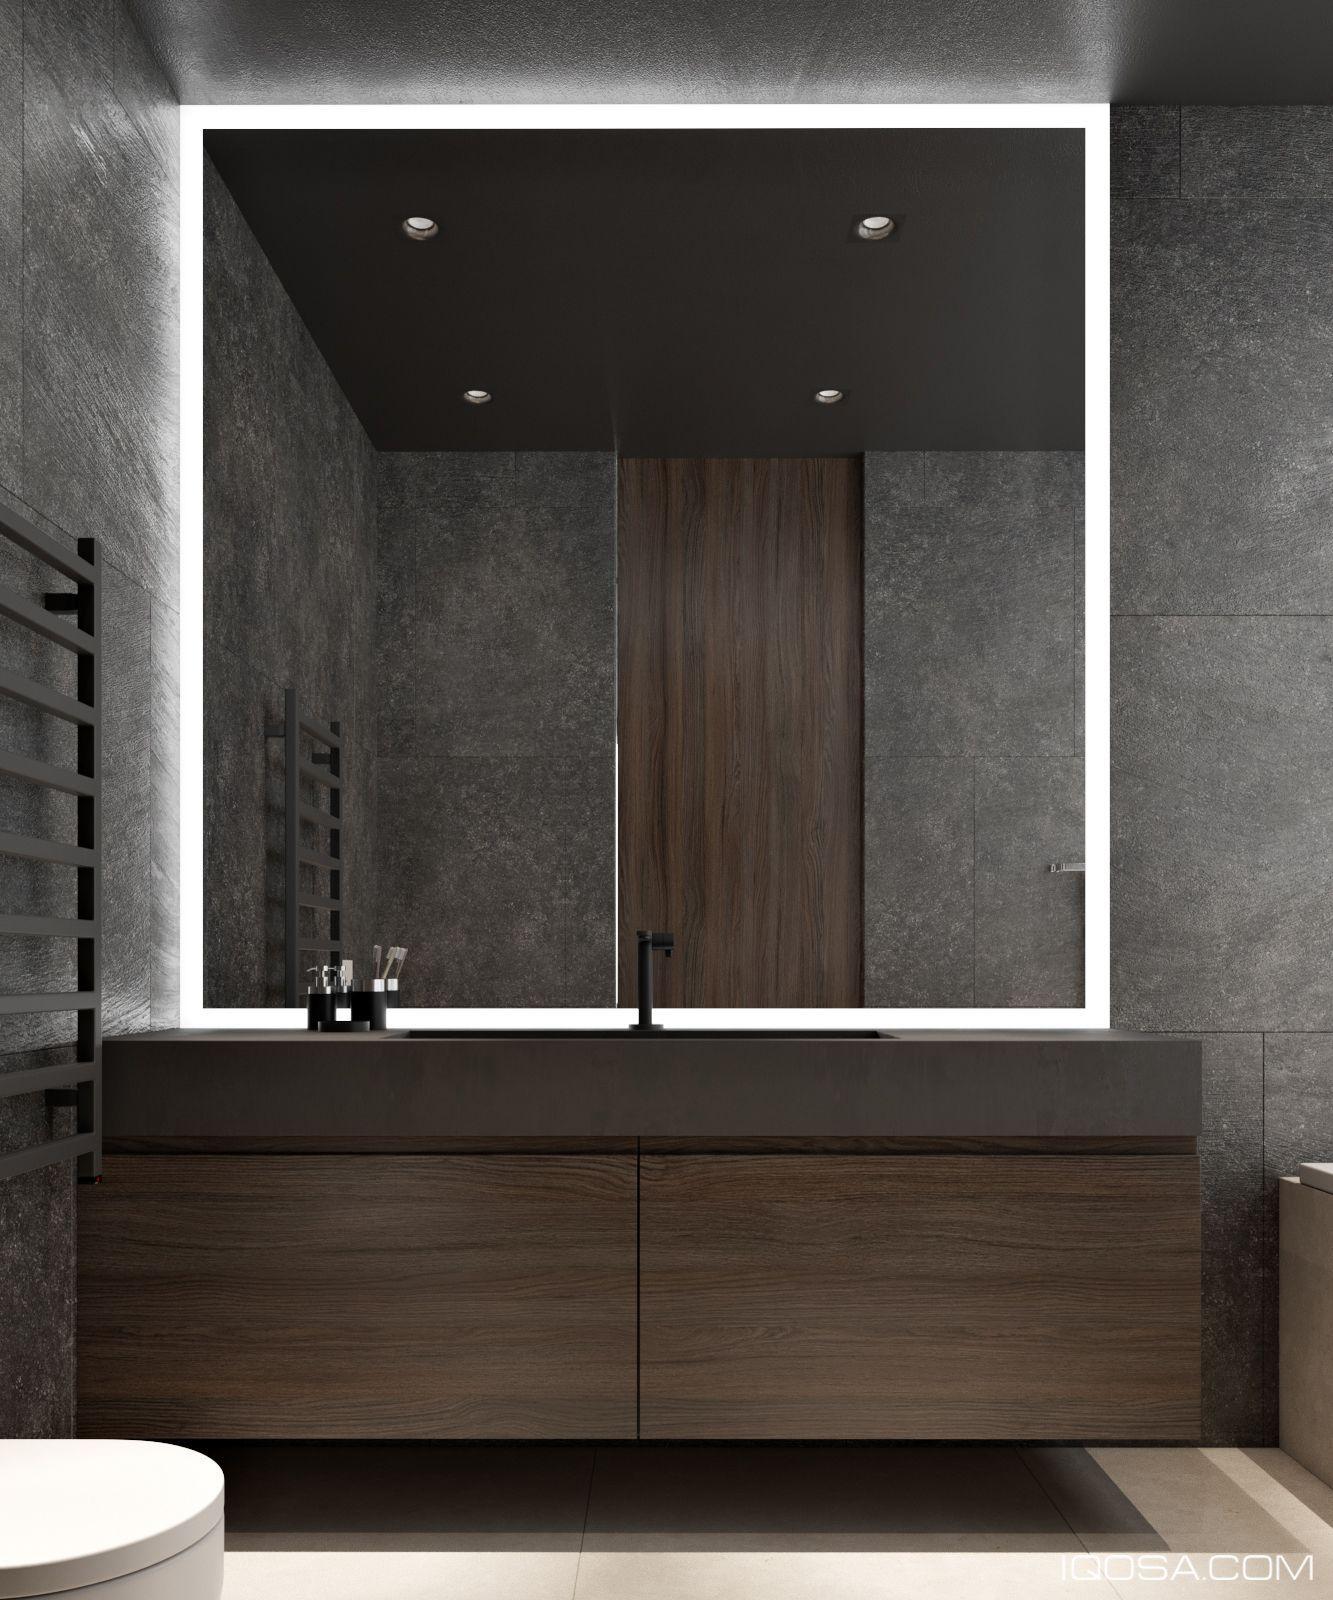 Vanity Mirror Bathroom Mirrors Vanity Mirror With Lights Wall Mirror Makeup Mirror With Lights Full Lengt Bathroom Model Bathroom Mirror Design Simple Bathroom